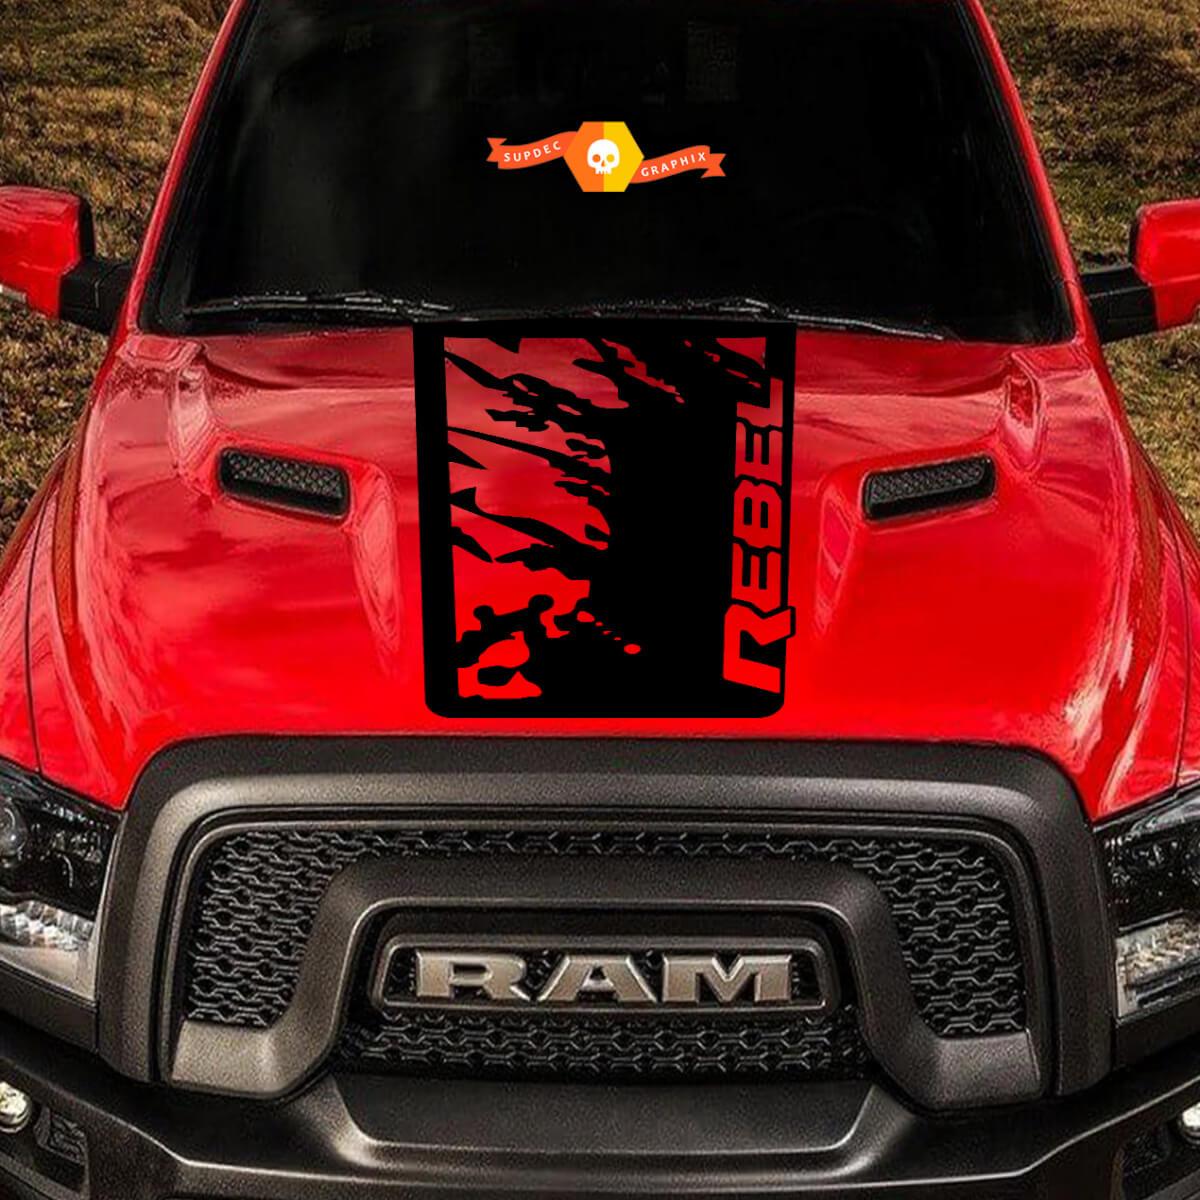 2015-2017 Dodge Ram Rebel Spritzhaube LKW Vinyl Aufkleber Grafik Grunge Splatter